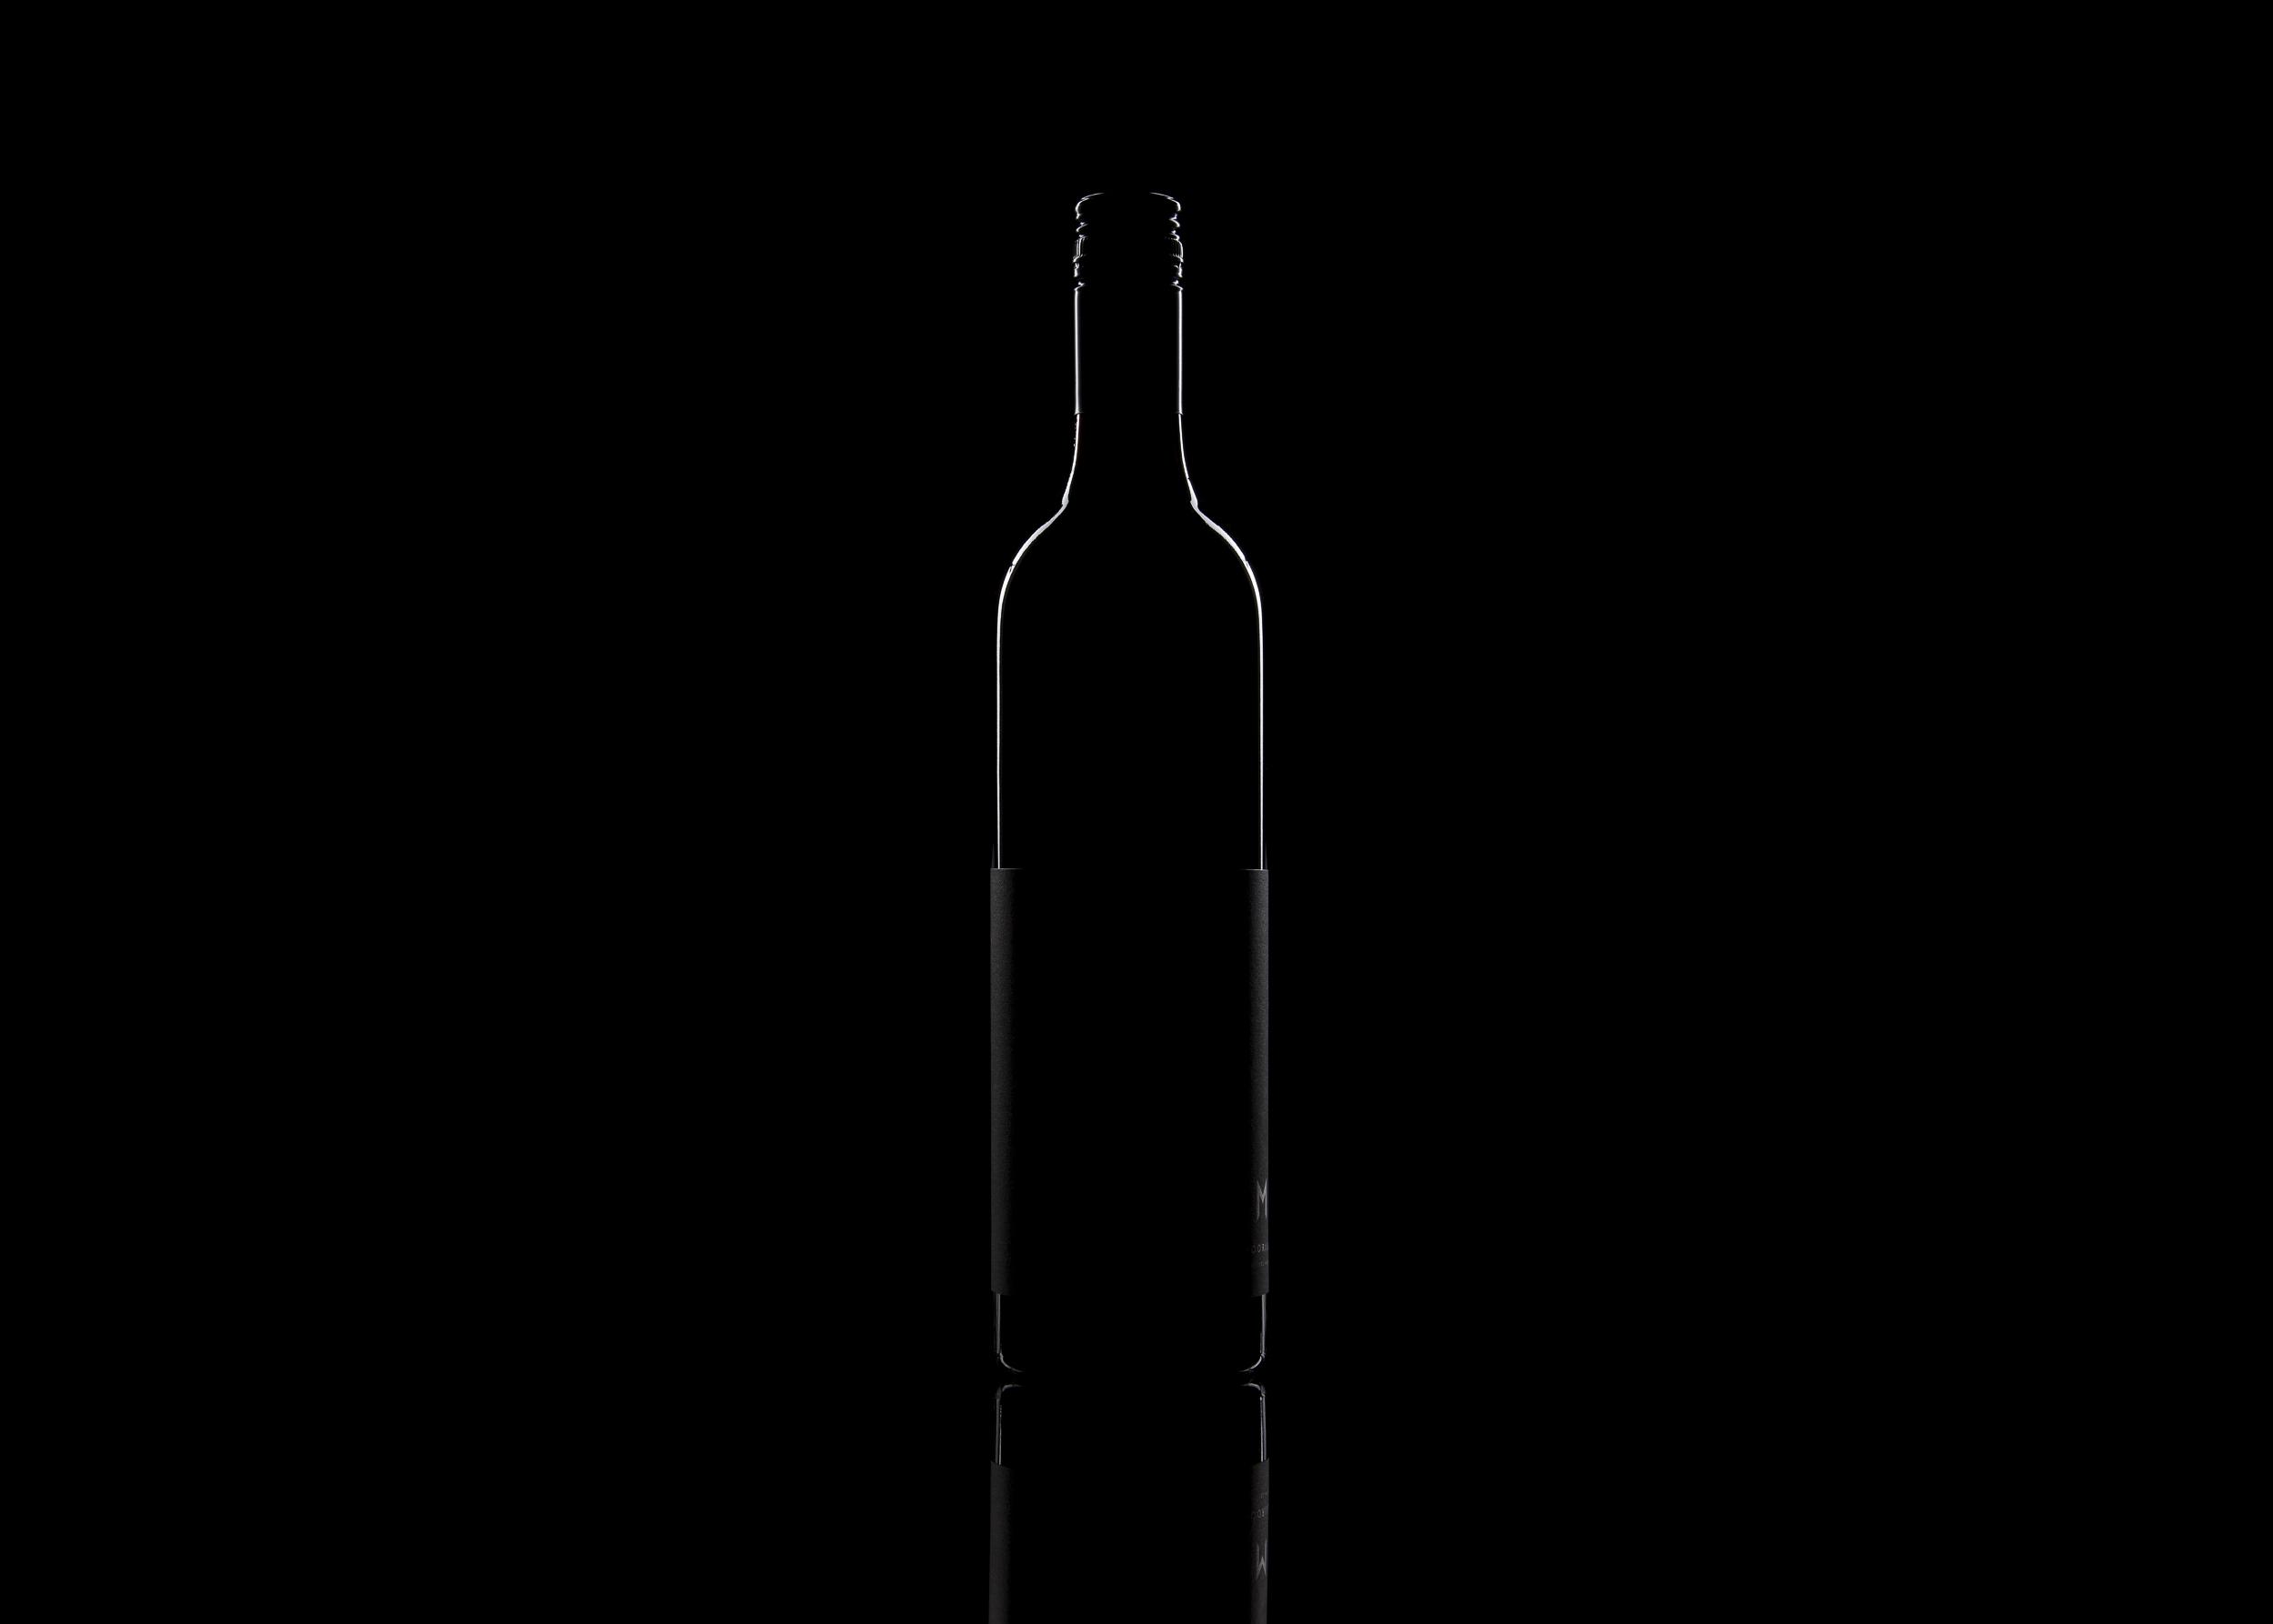 Branding image for Moorilla winery